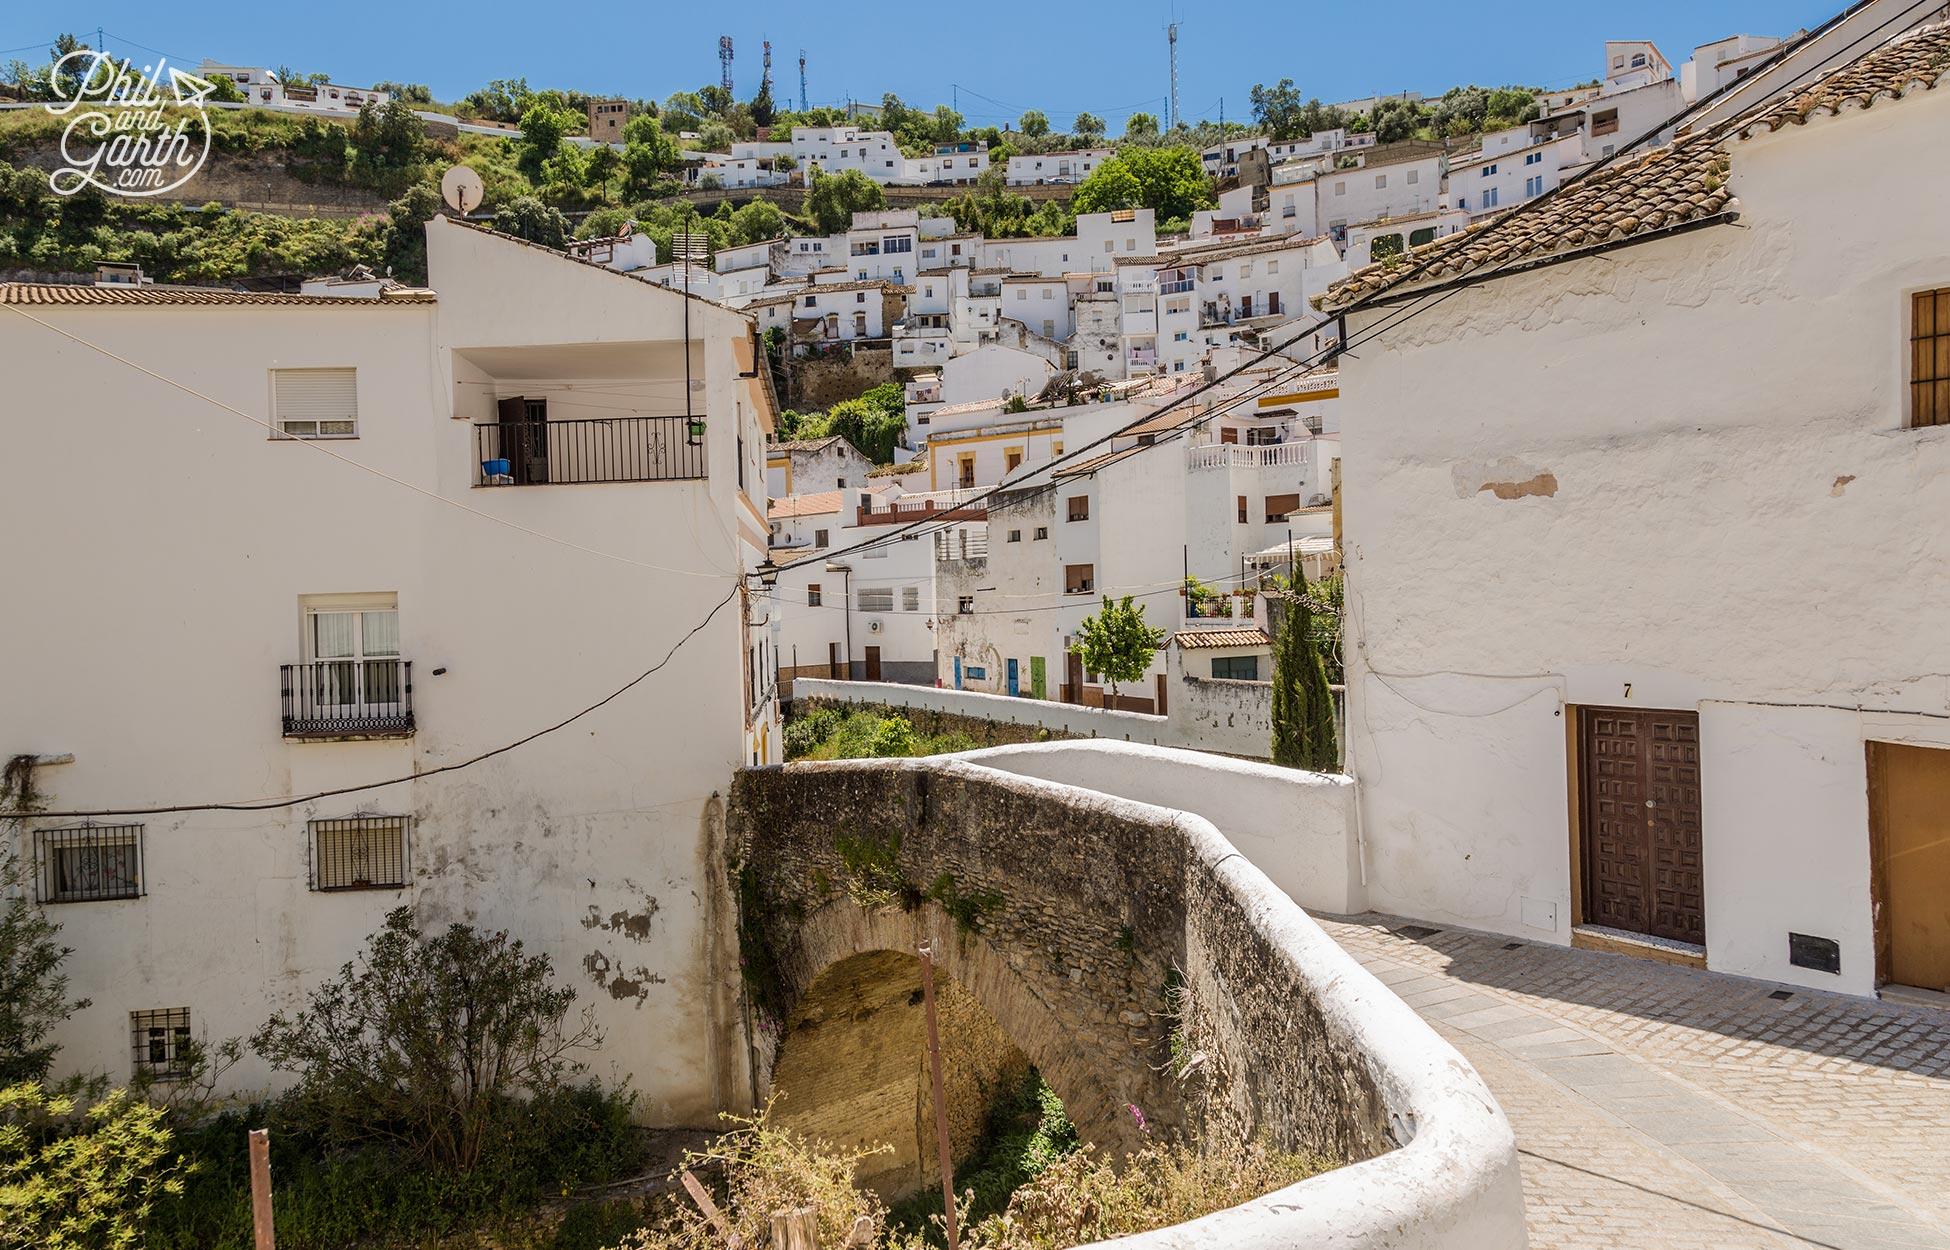 Wandering the streets of Setenil de las Bodegas